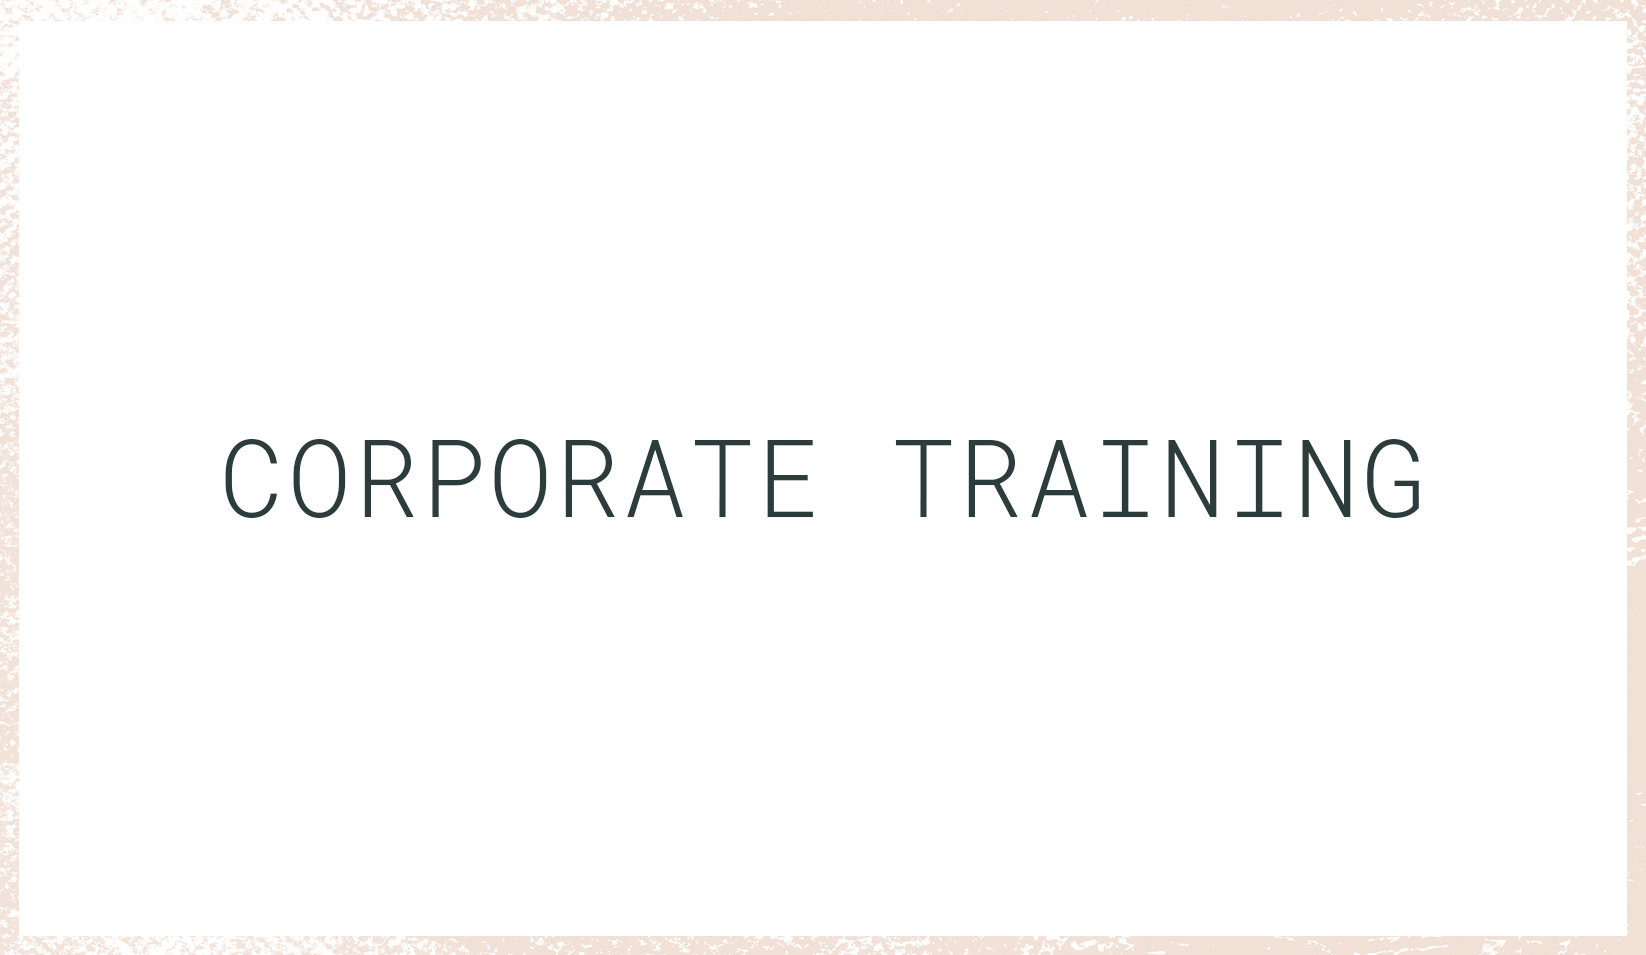 CorporateTraining3.jpg